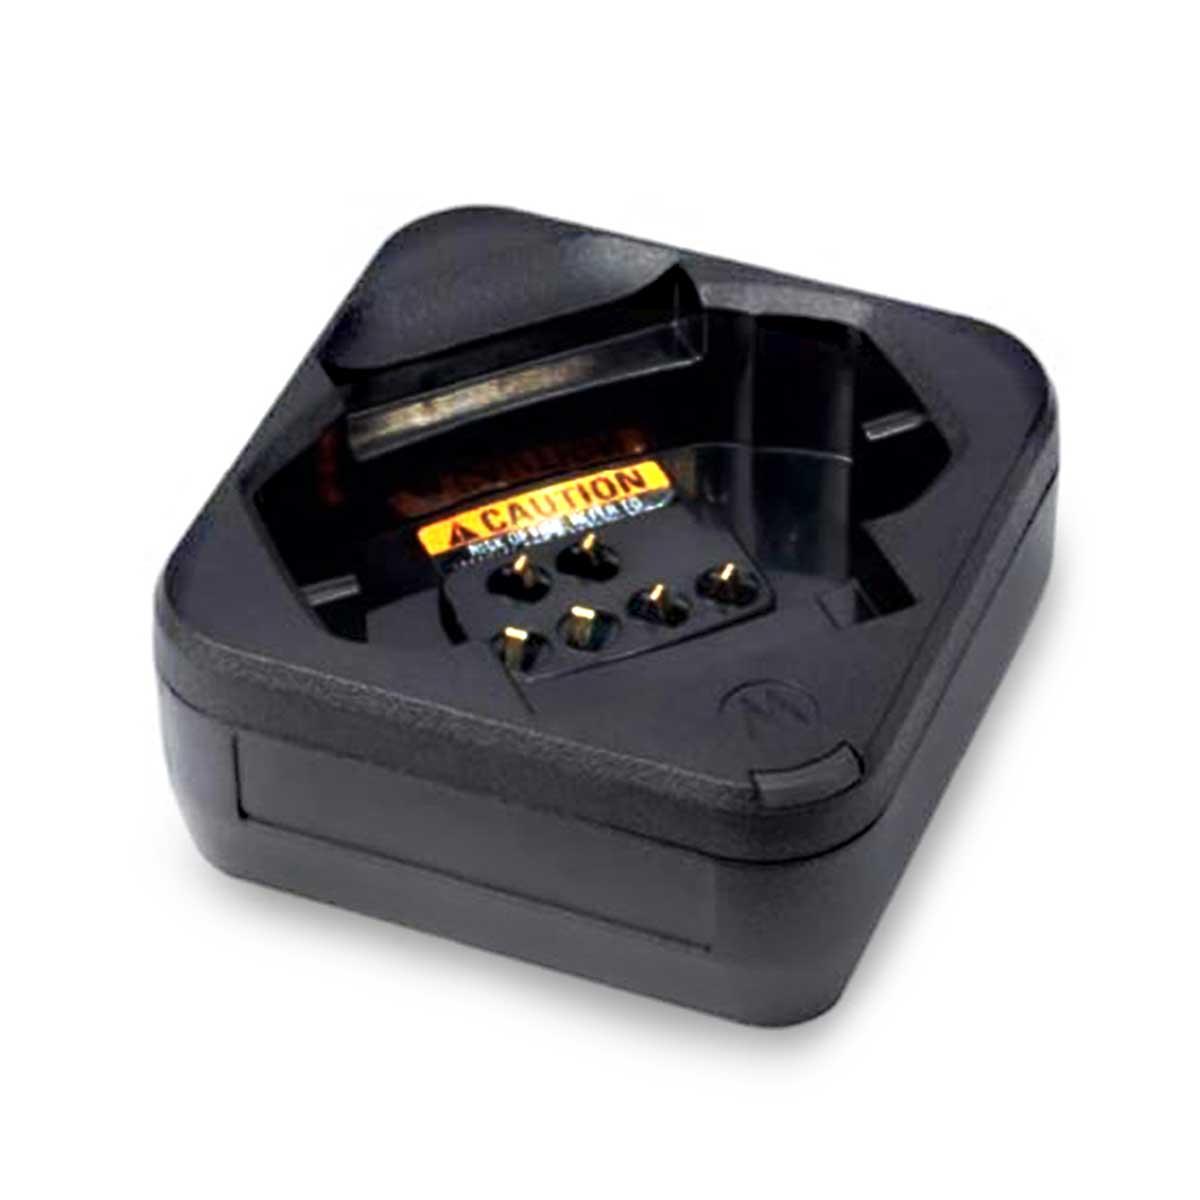 Cargador individual Motorola PMPN4469A para radio DTR720